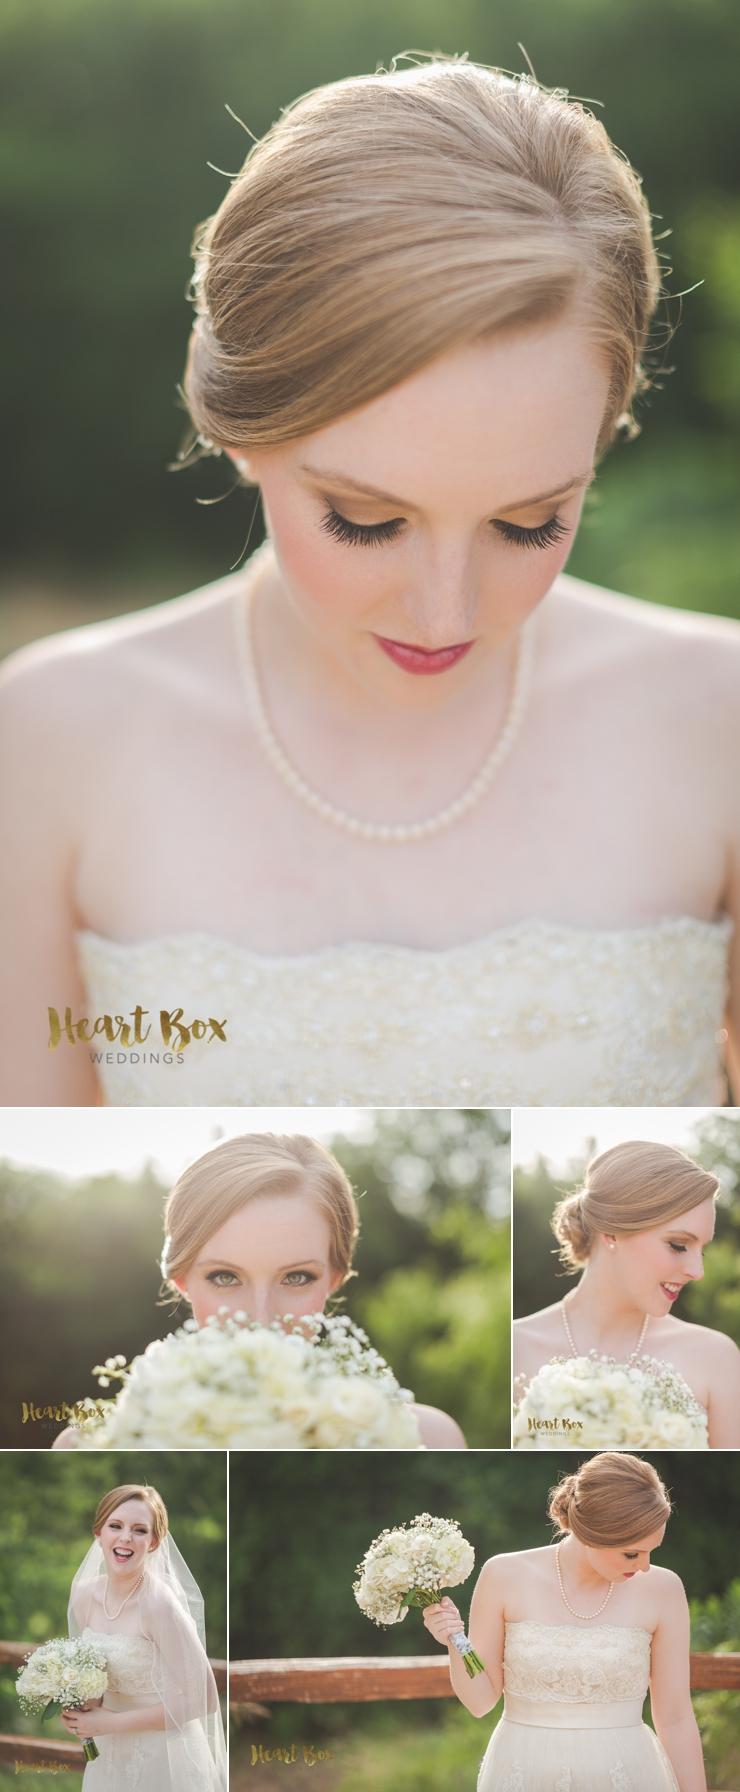 Kaylin Bridal Blog Collages 1.jpg